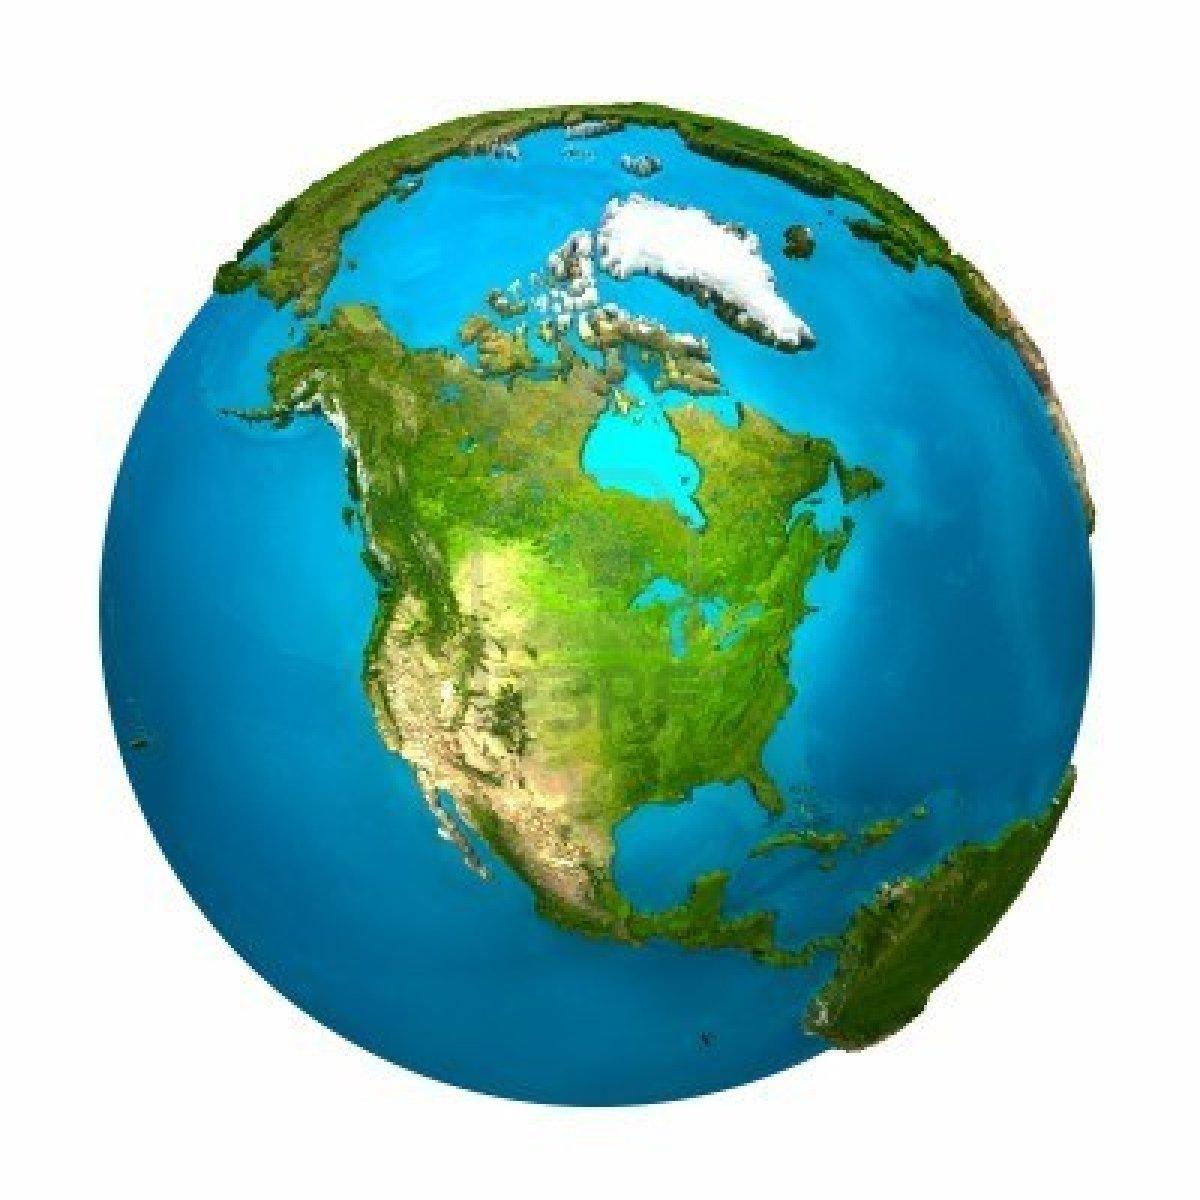 planet earth globe - photo #3